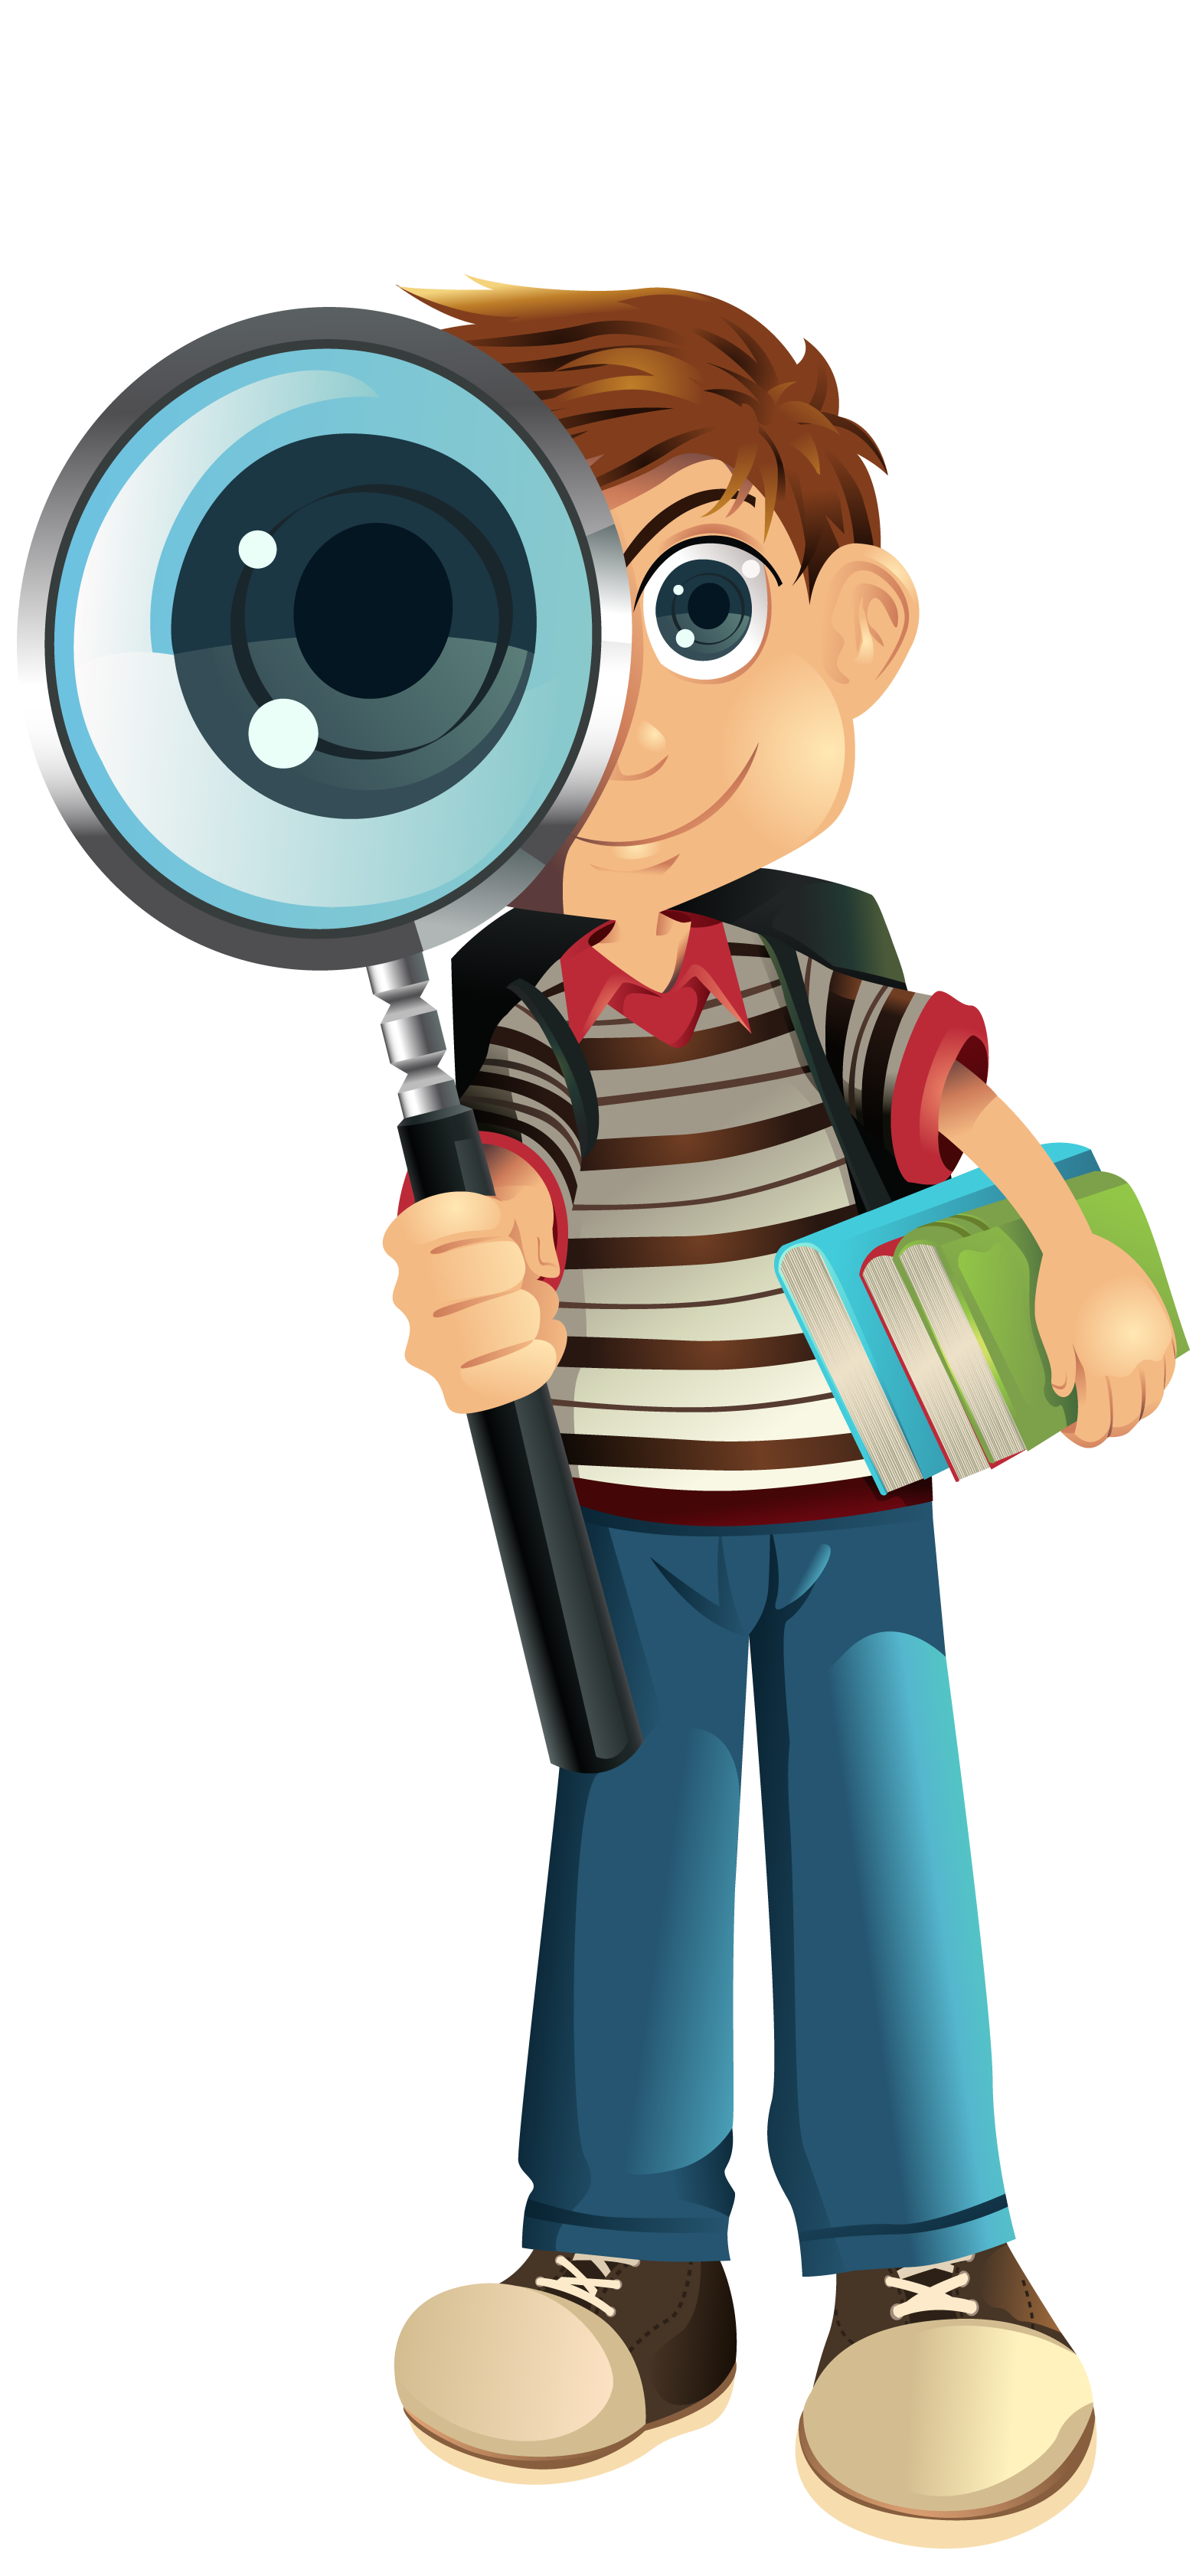 Detective clipart mystery genre. Forensic workshops for kids